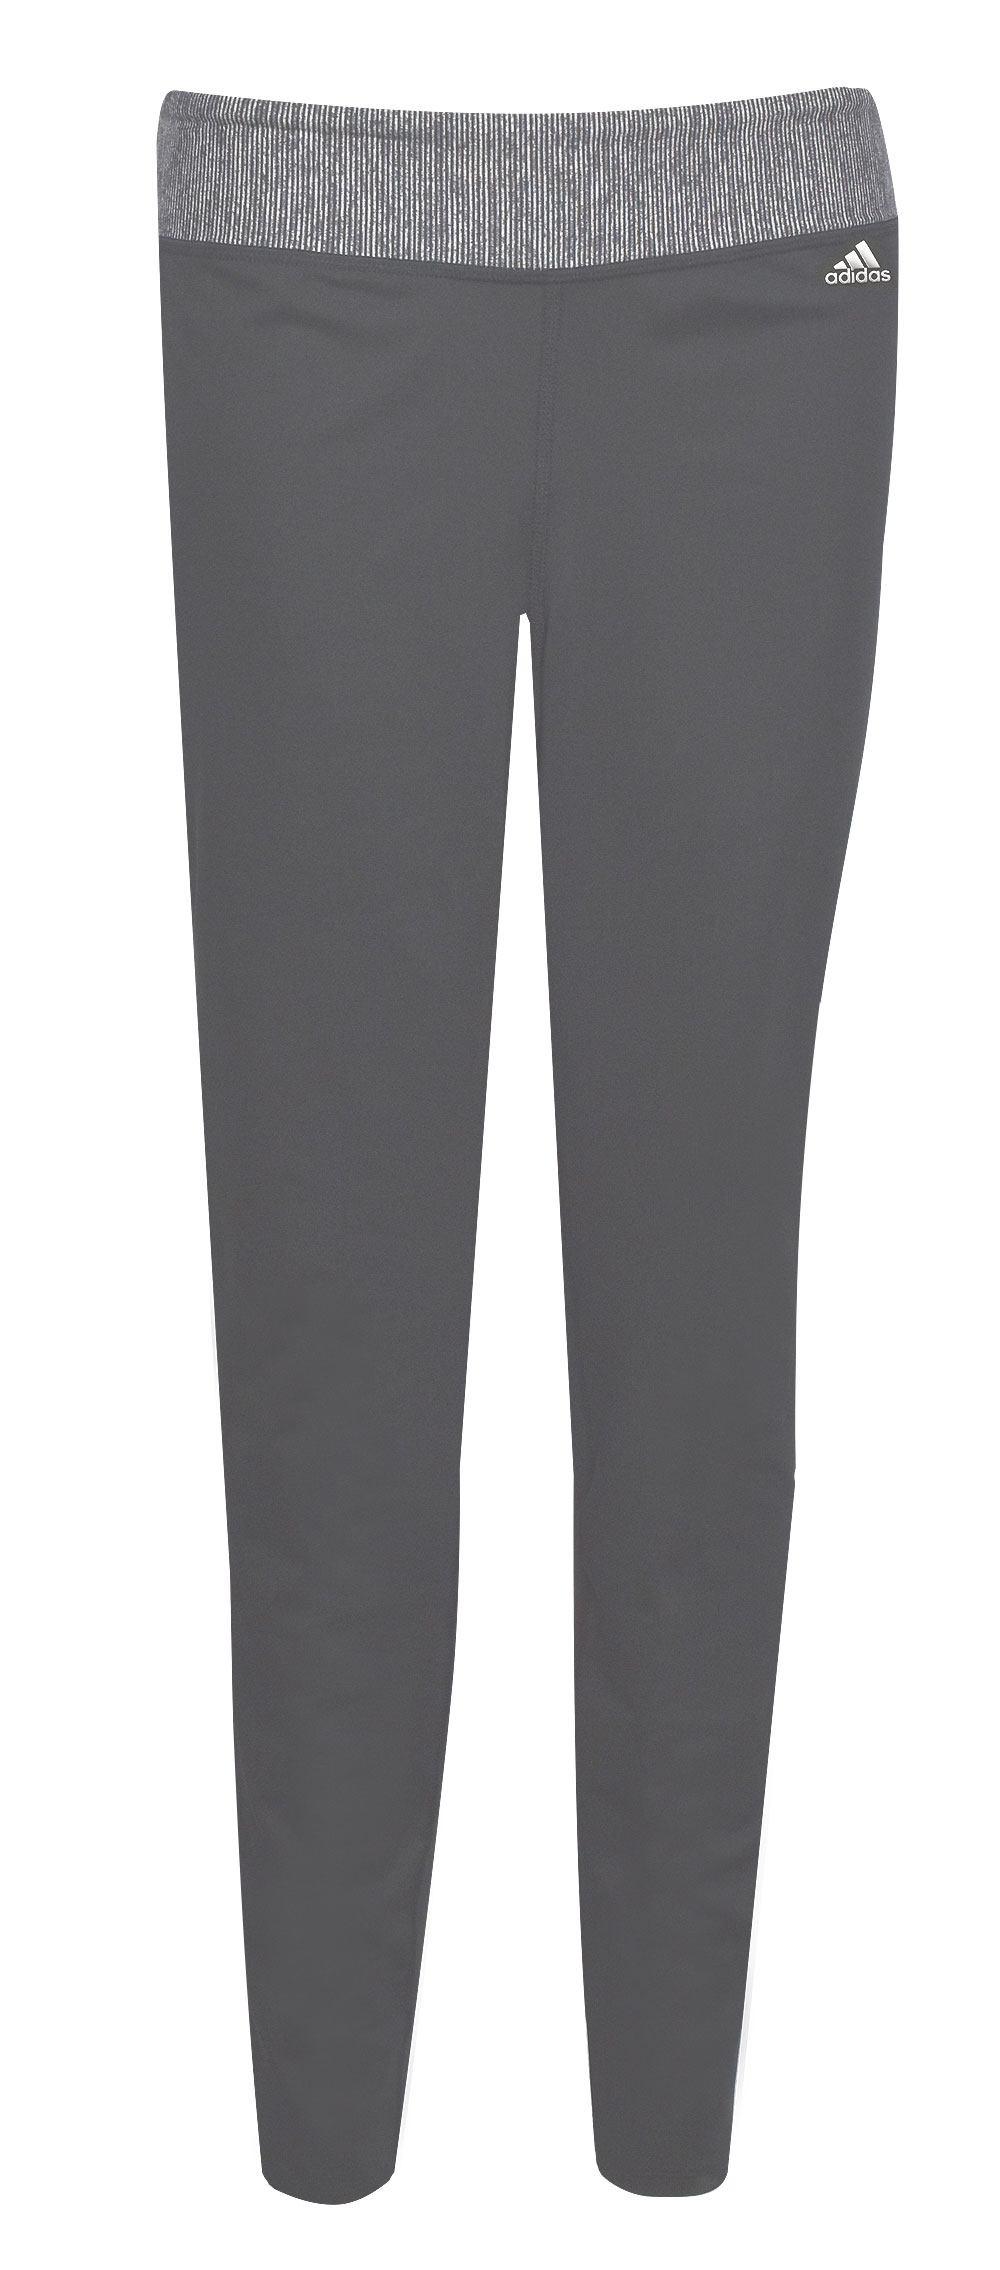 02bab63ed8b Ladies Adidas Climawarm Leggings | RockBottomGolf.com